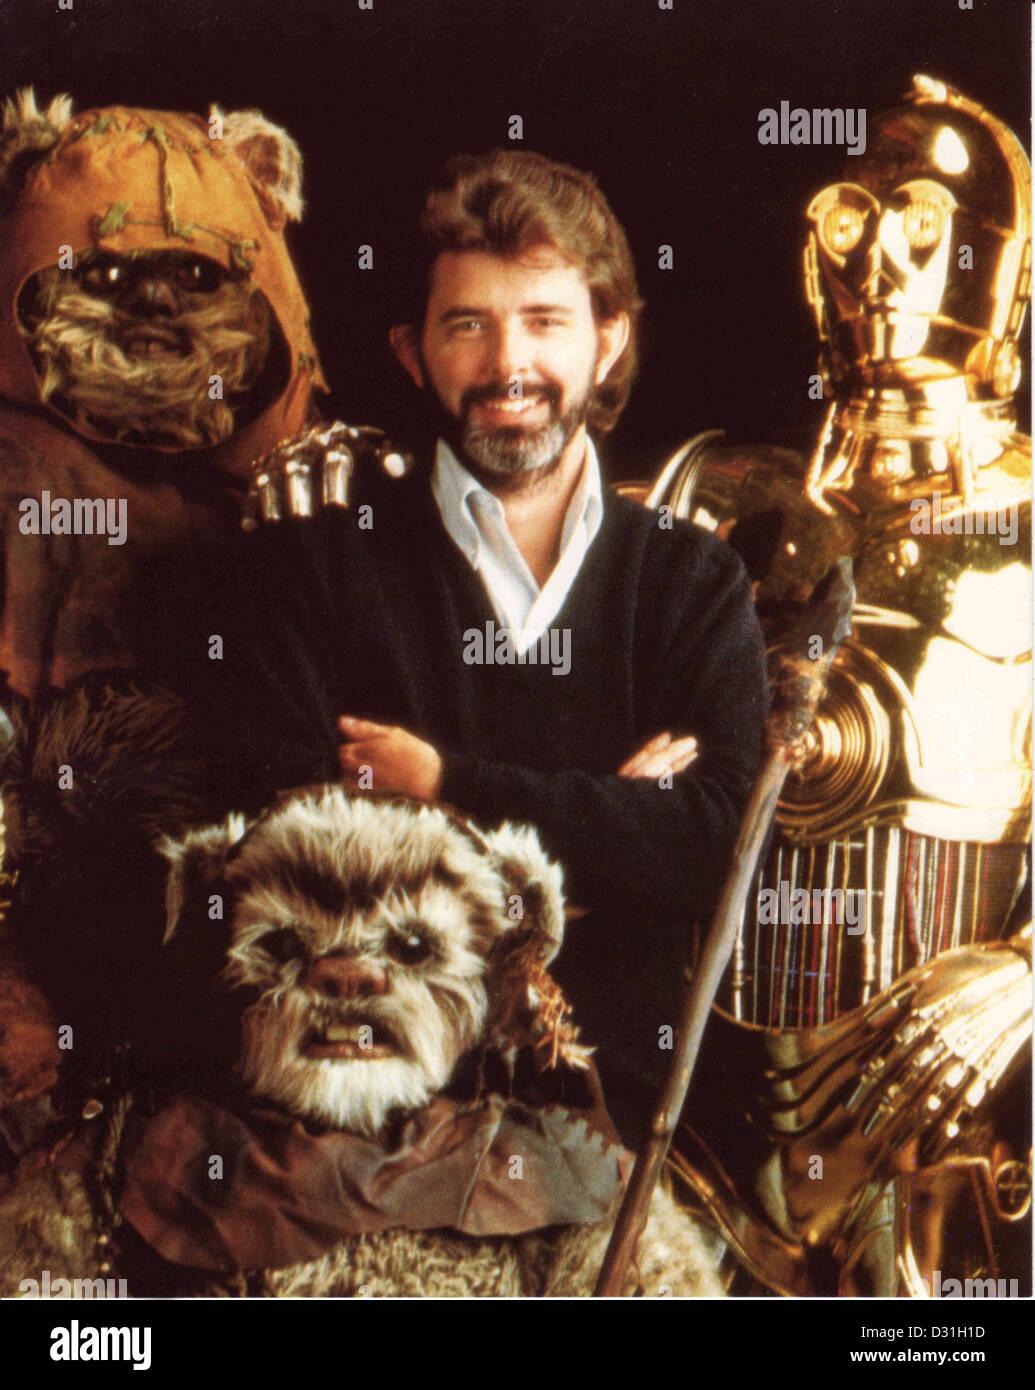 George Lucas Immagini Stock